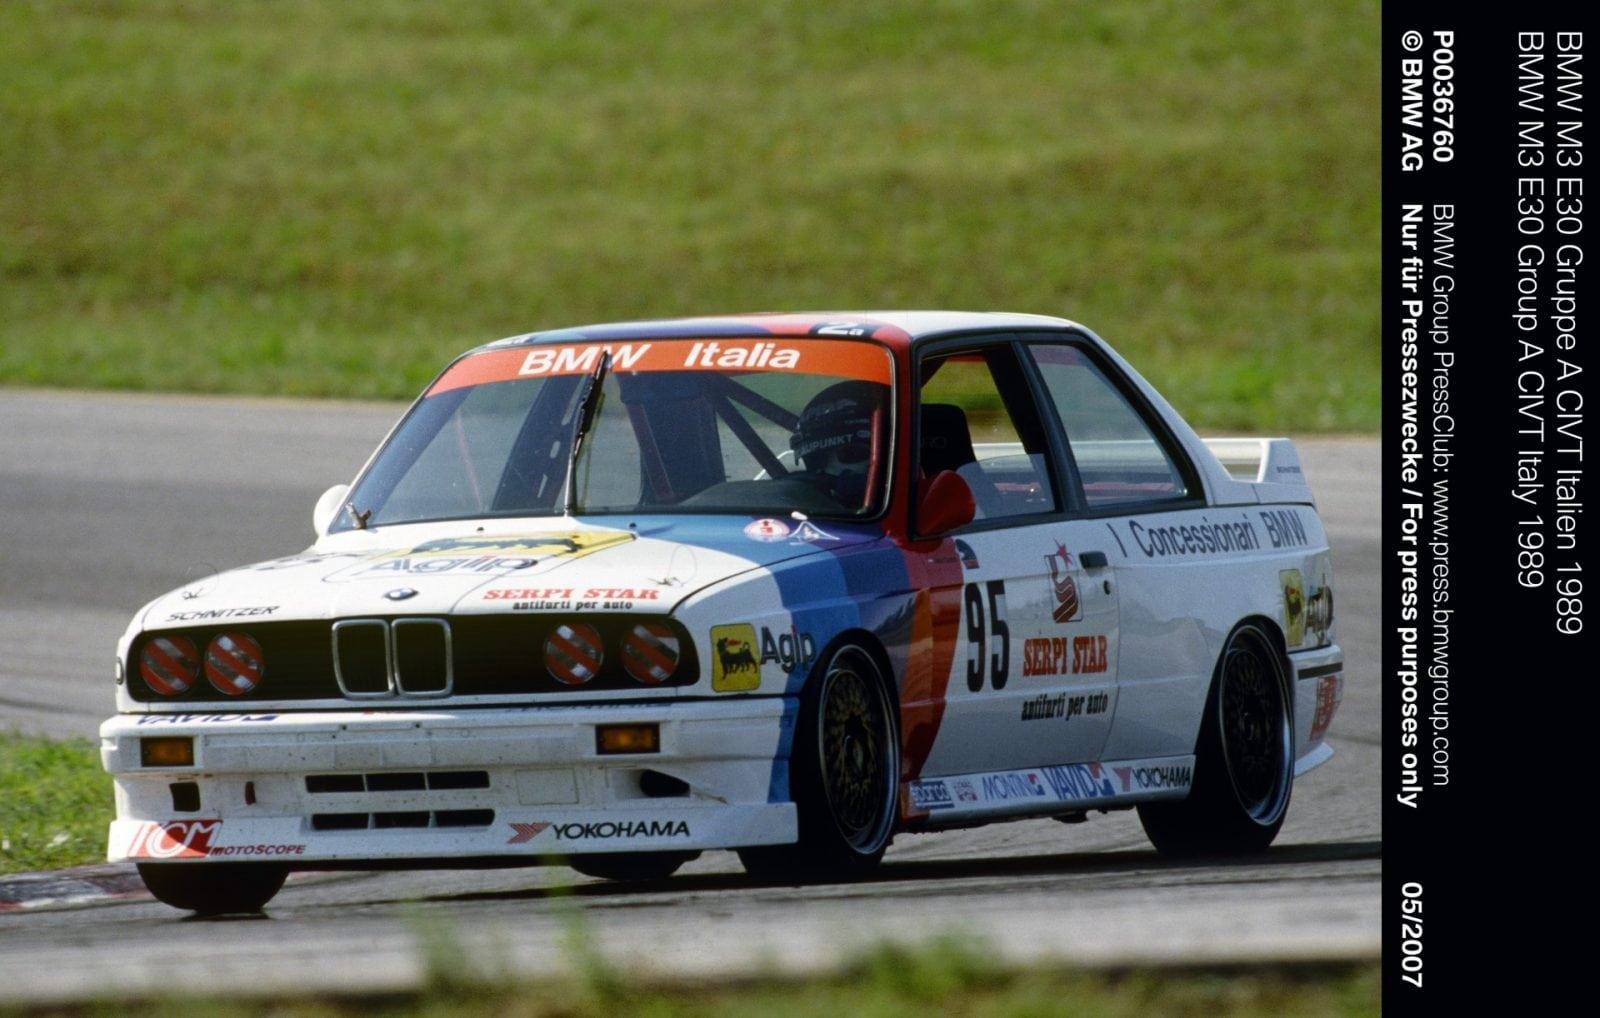 BMW M3 E30 Gruppe A CIVT Italy 1989